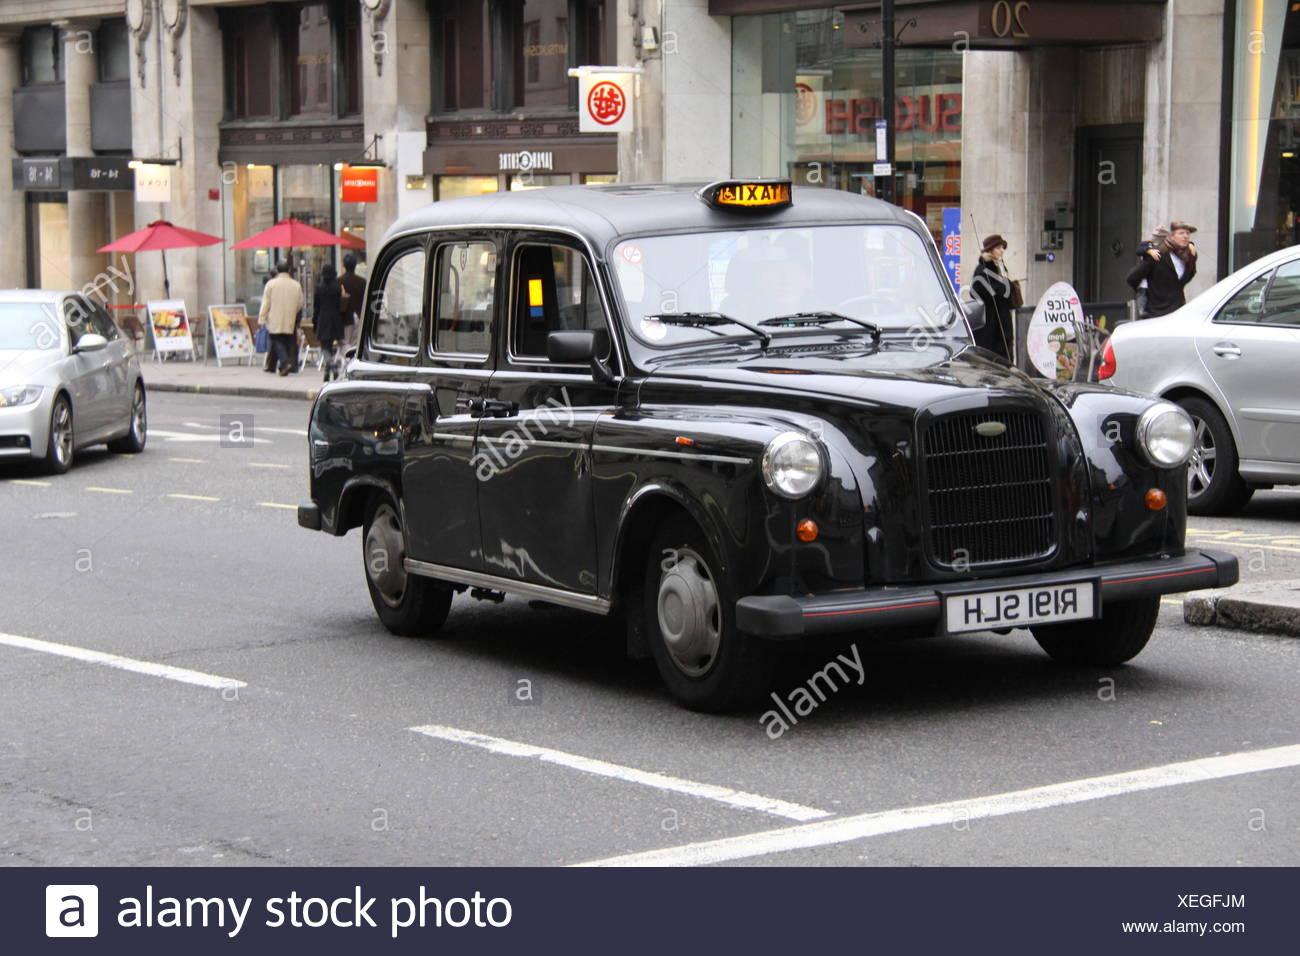 London Cab - Stock Image